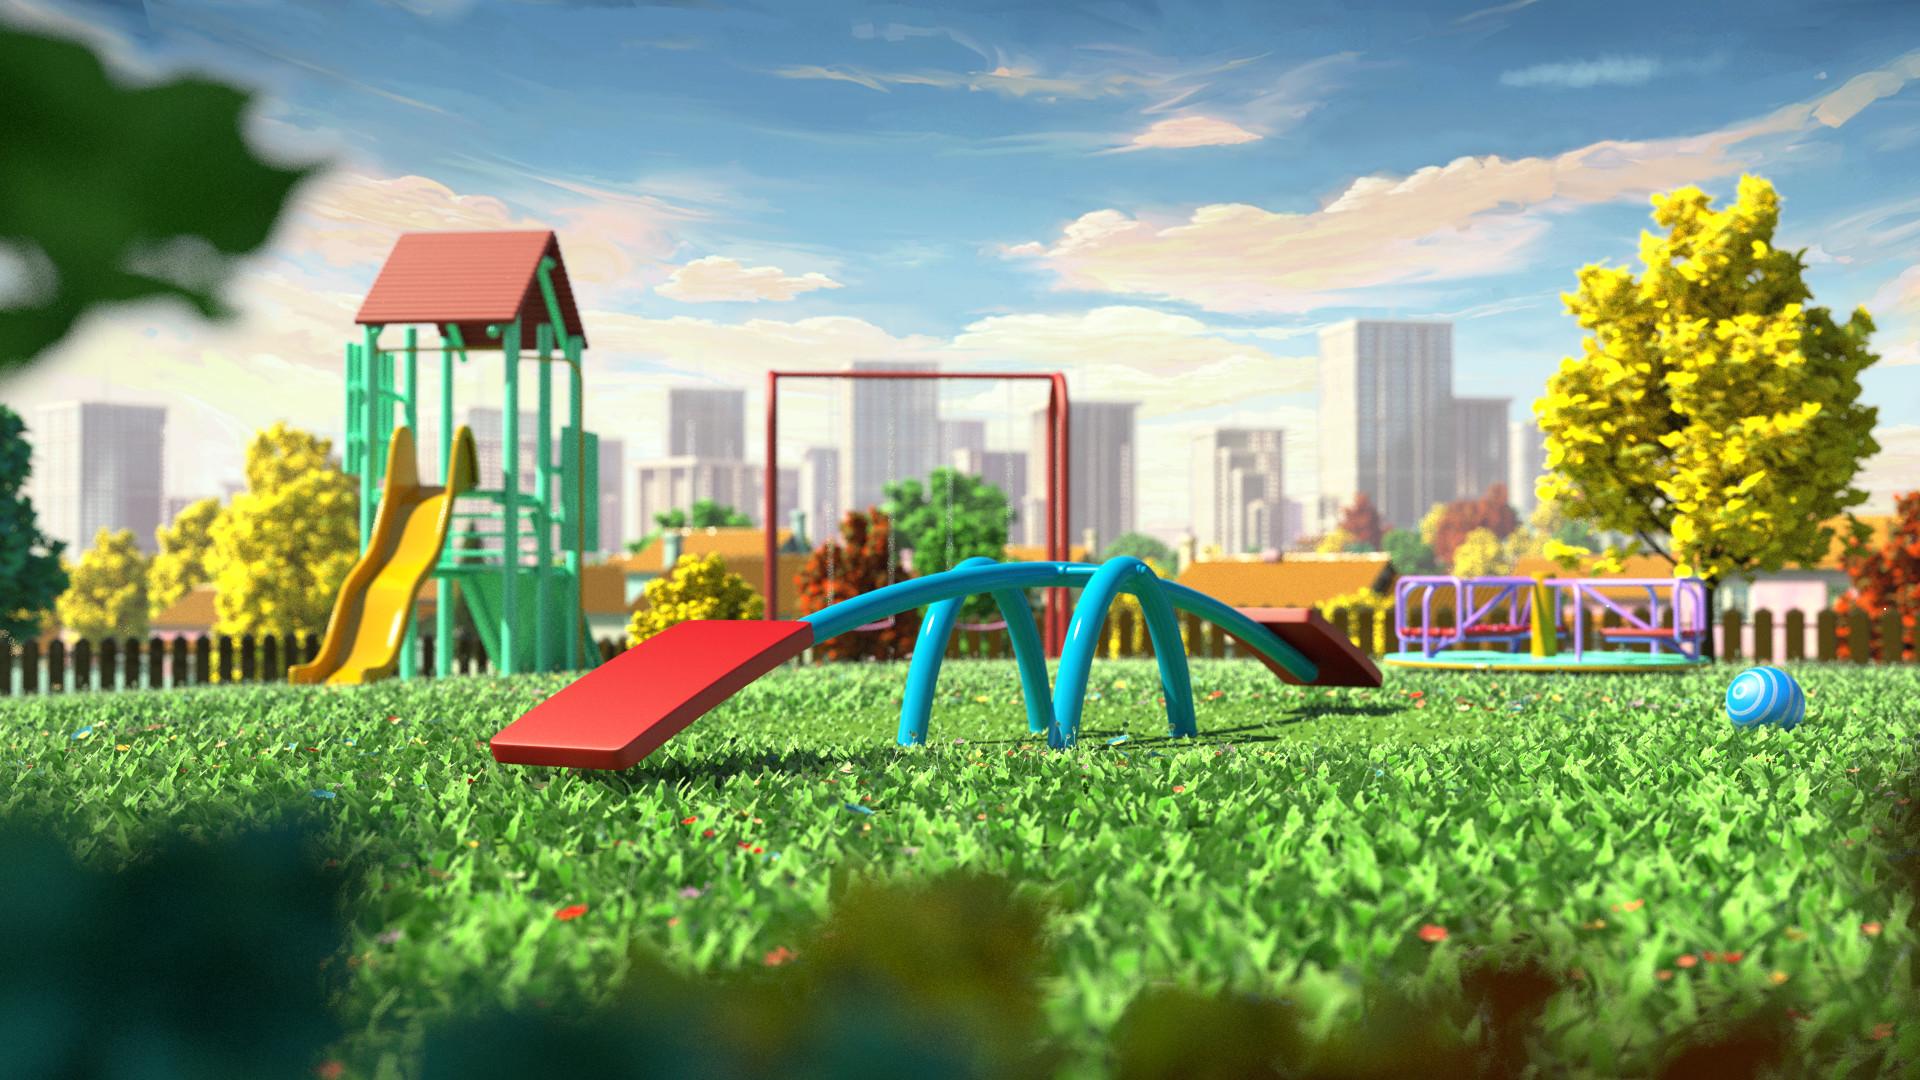 Caglar ozen sh playground 002